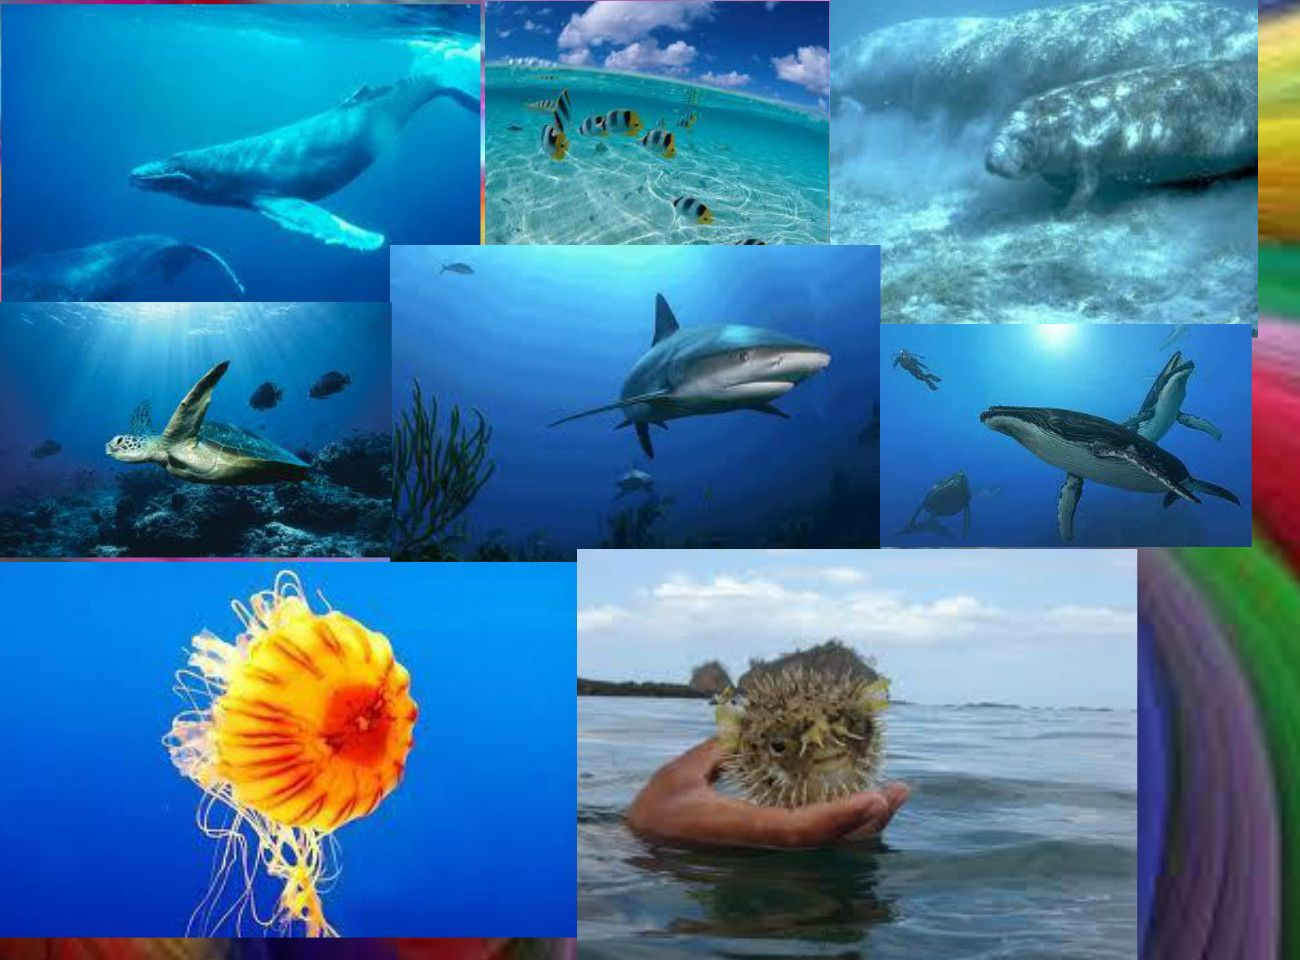 ocean biome - Google Search | Biomes | Pinterest | Biomes ...